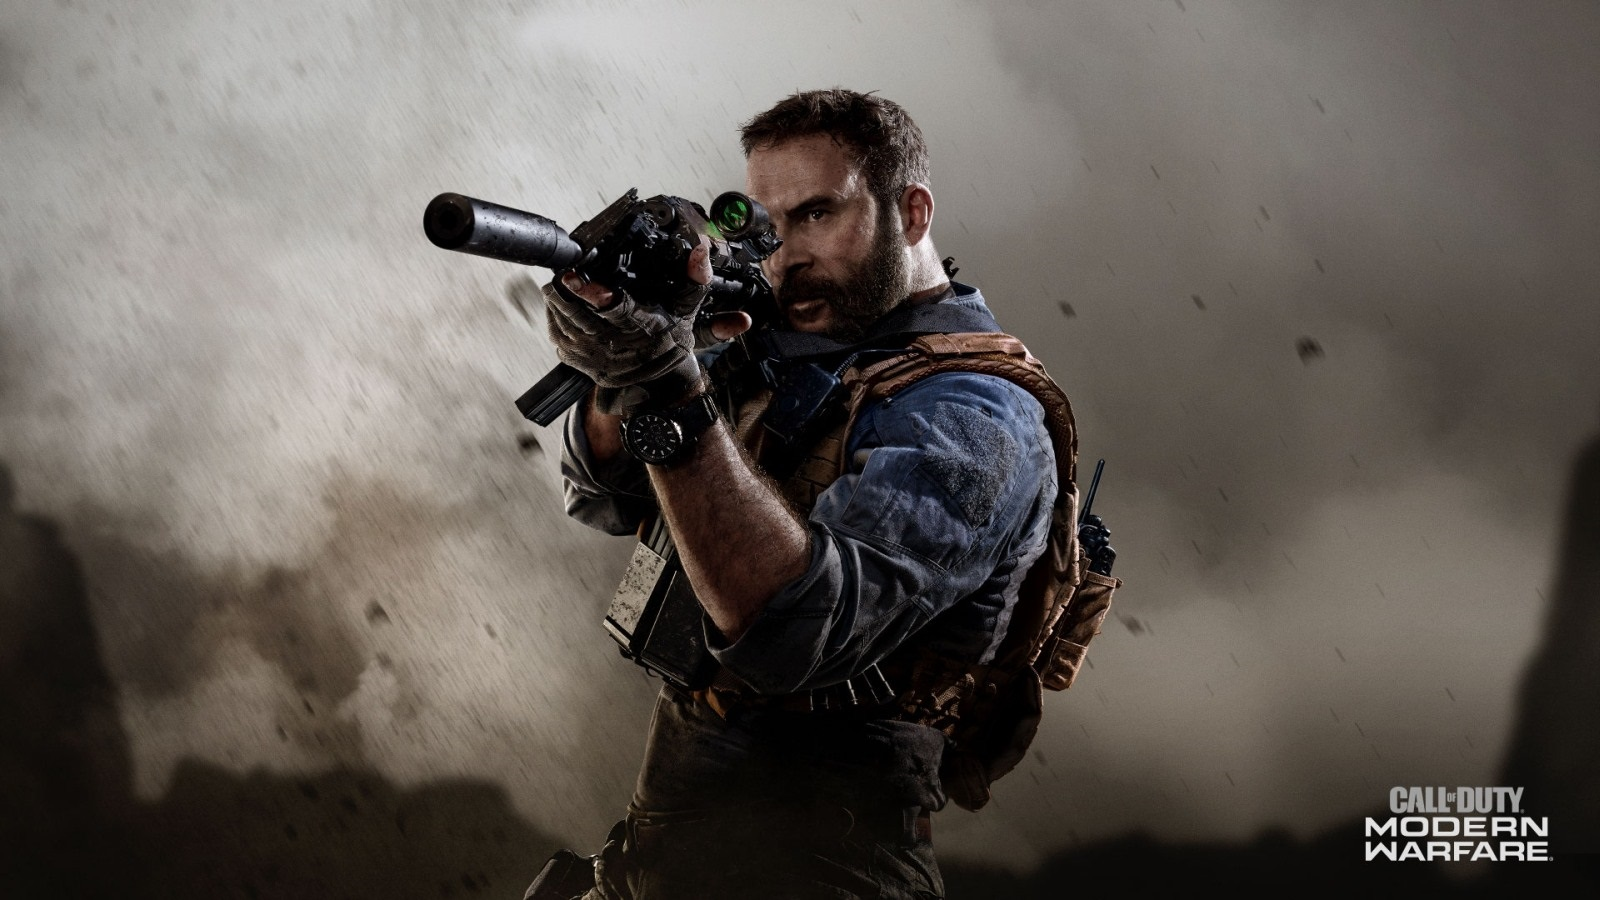 Call of Duty Modern Warfare; screenshot: scope